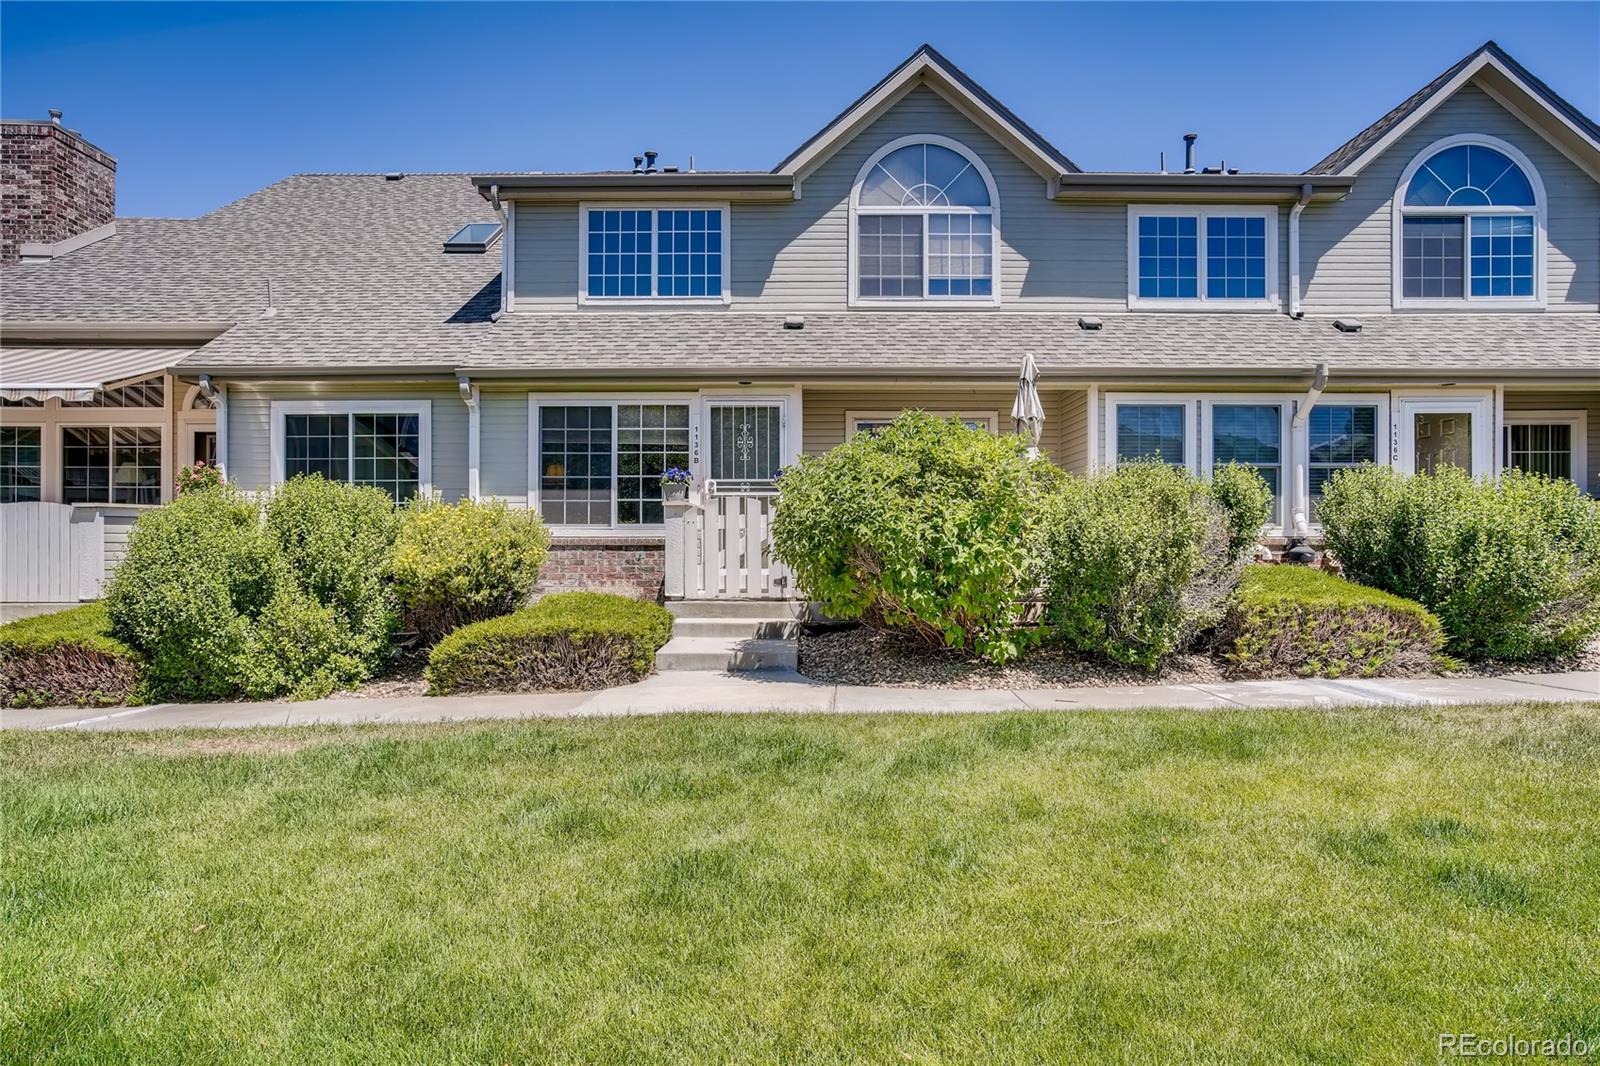 1136 E 130th Avenue #B Property Photo - Thornton, CO real estate listing